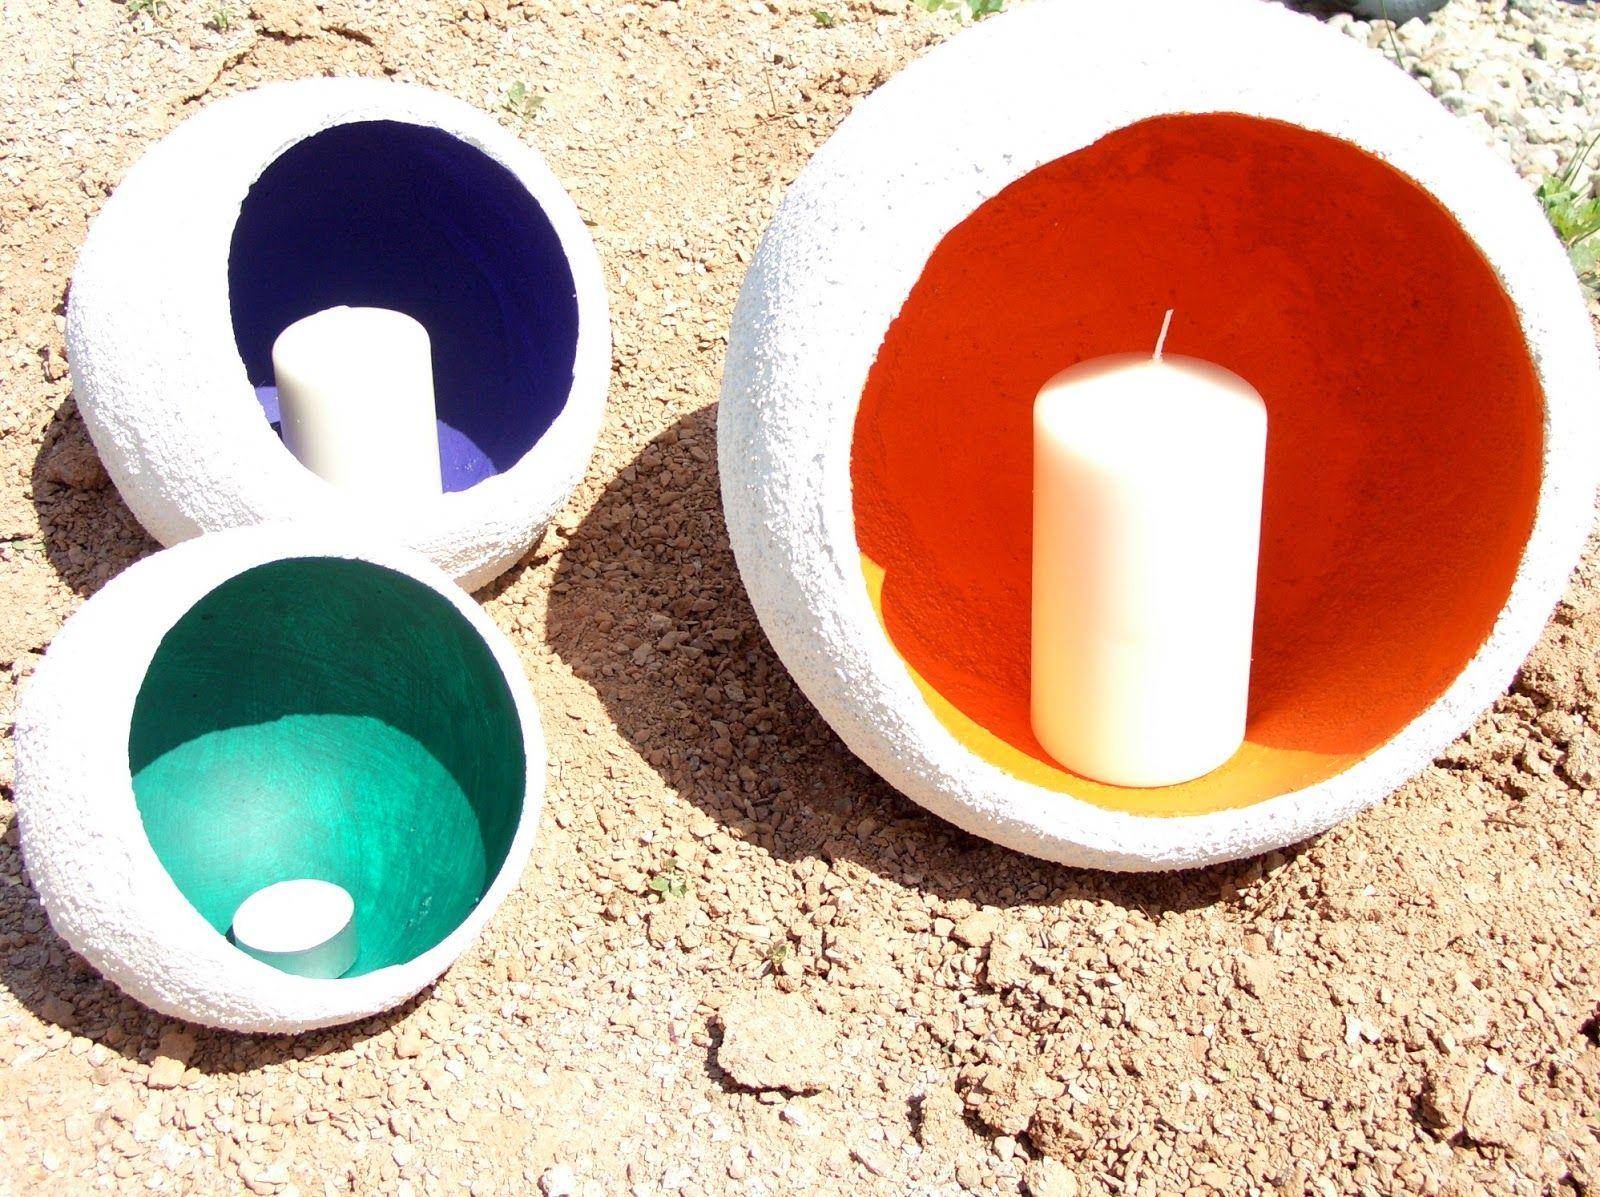 Gartendeko Blog: Gartendeko Aus Beton ~ Zement Ideen